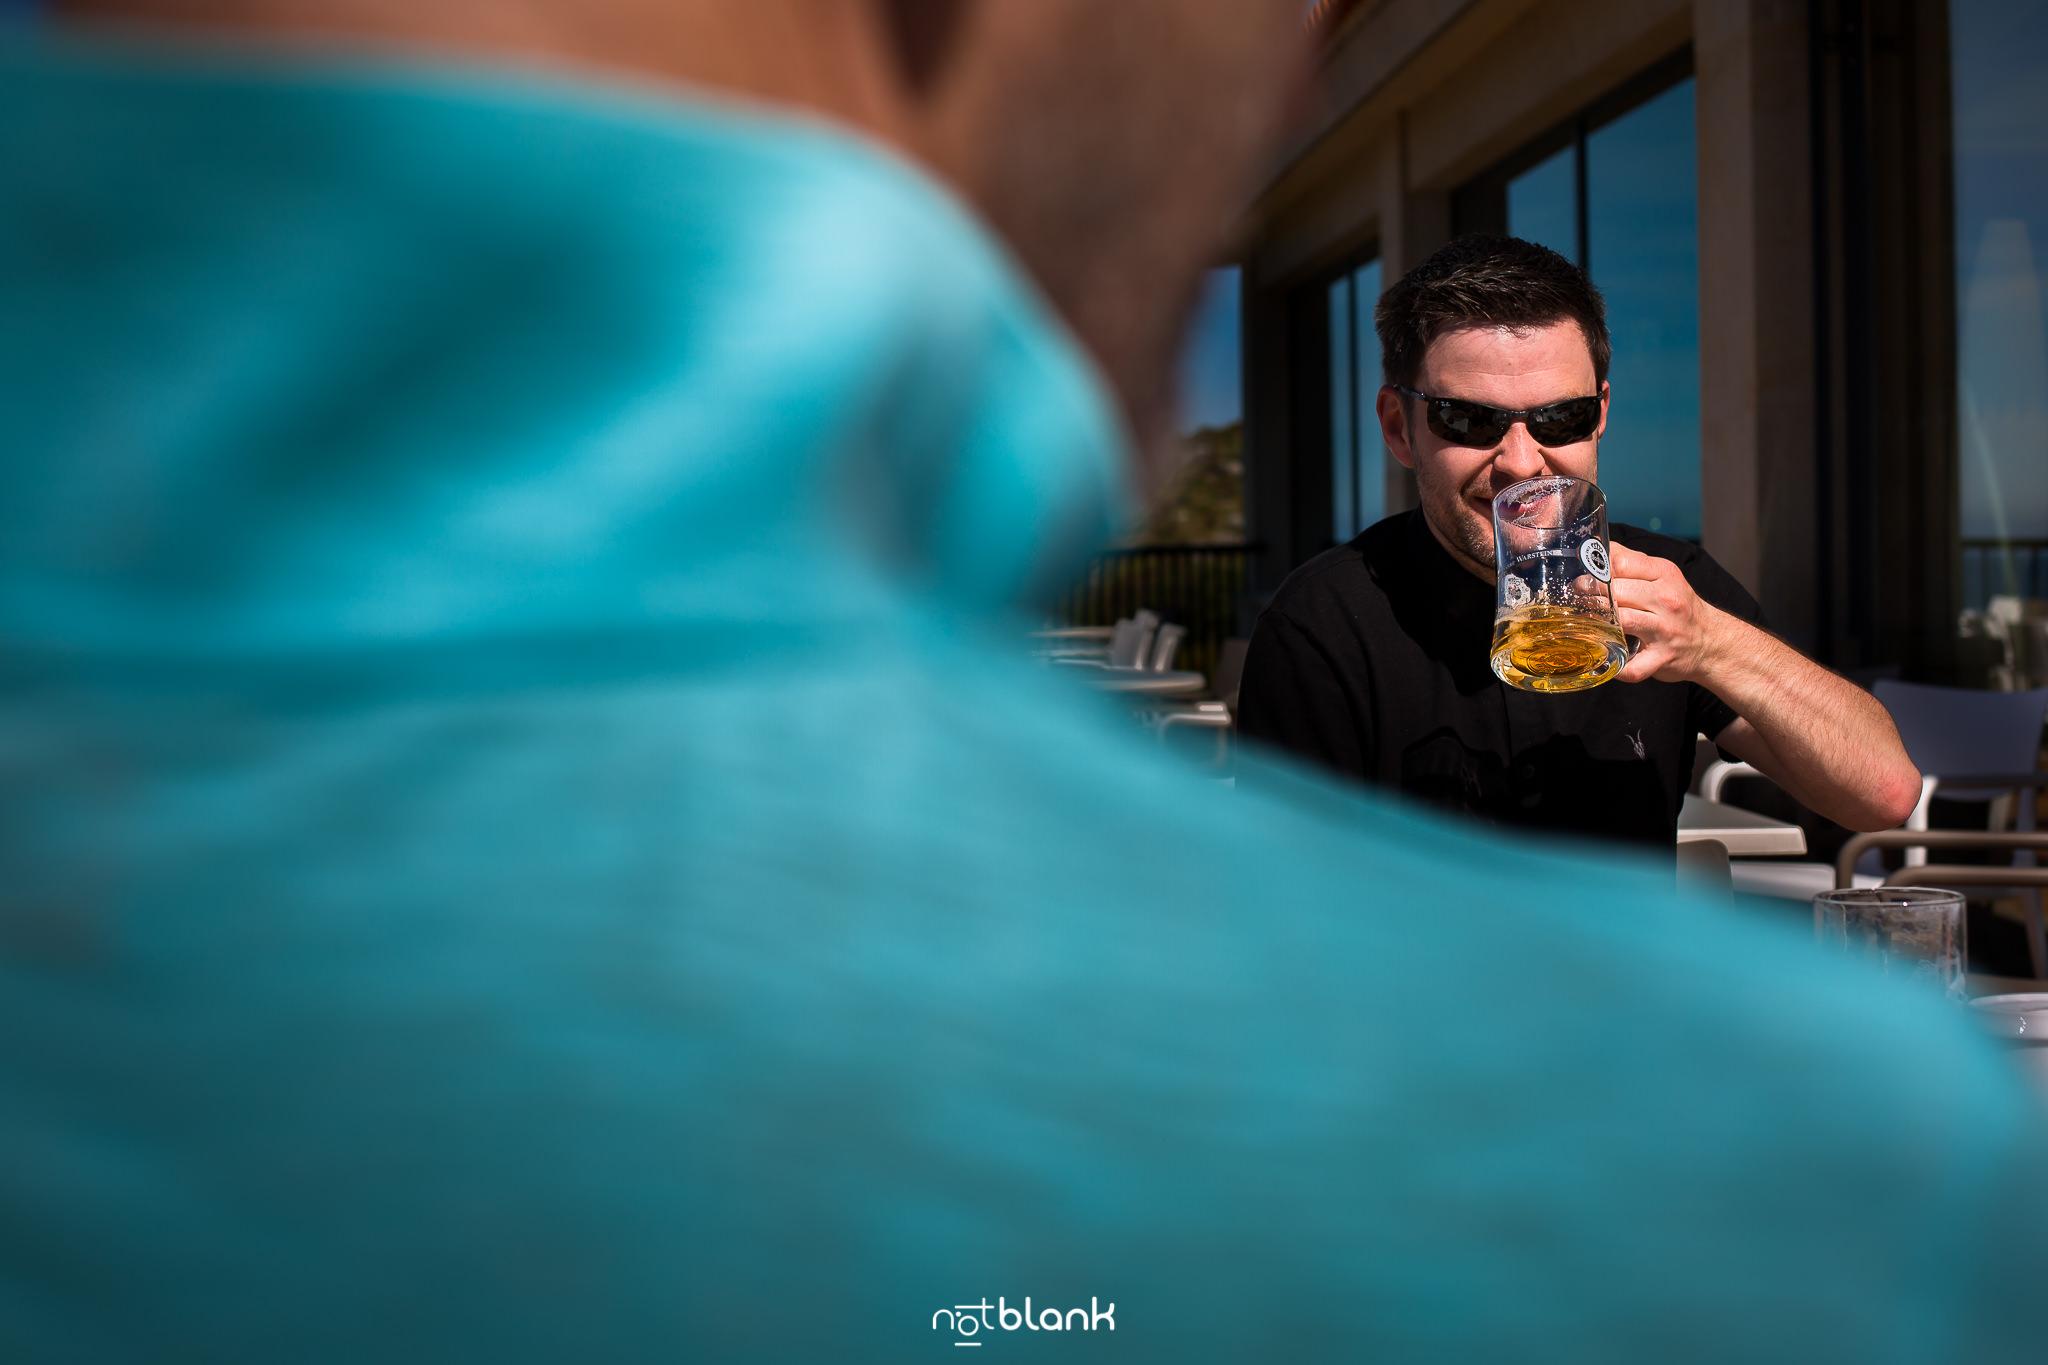 Boda-Maite-David-Terraza-Hotel-Talaso-Atlantico-Invitado-Tomando-Cerveza. Reportaje realizado por Notblank fotógrafos de boda